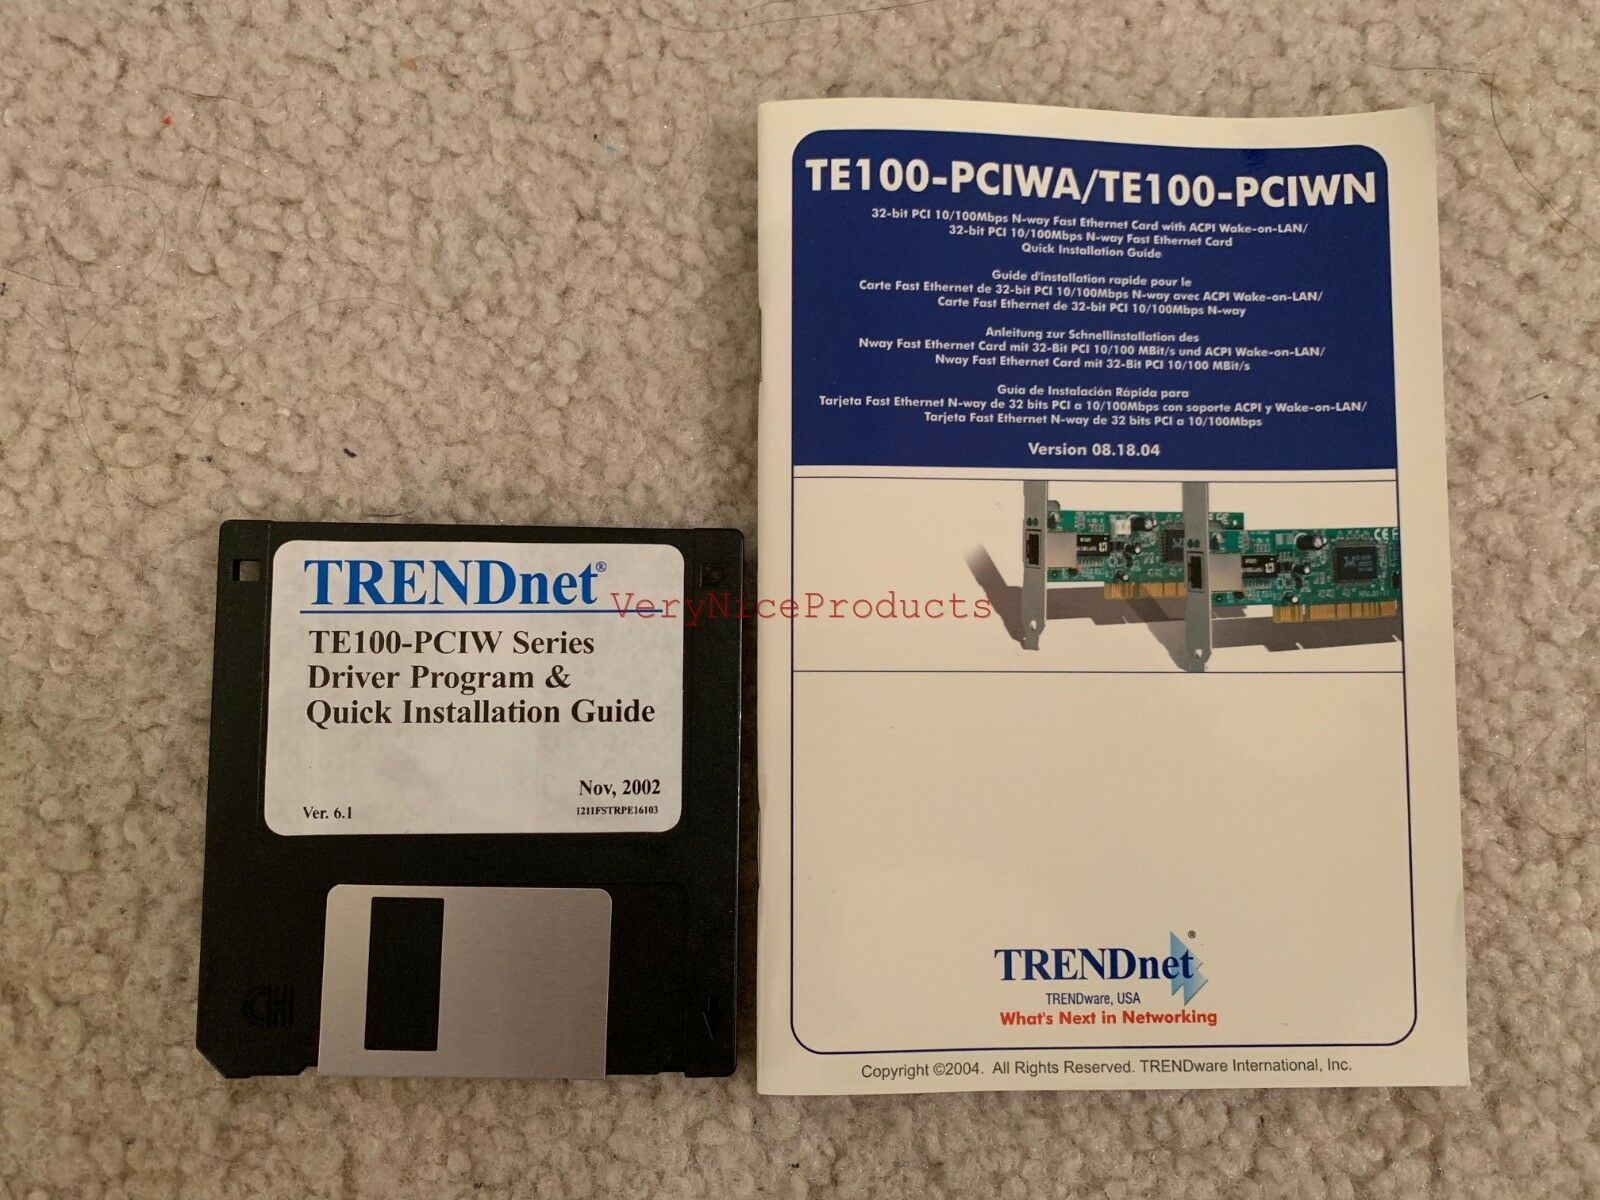 TRENDnet TE100-PCIWN Network Adapter Descargar Controlador